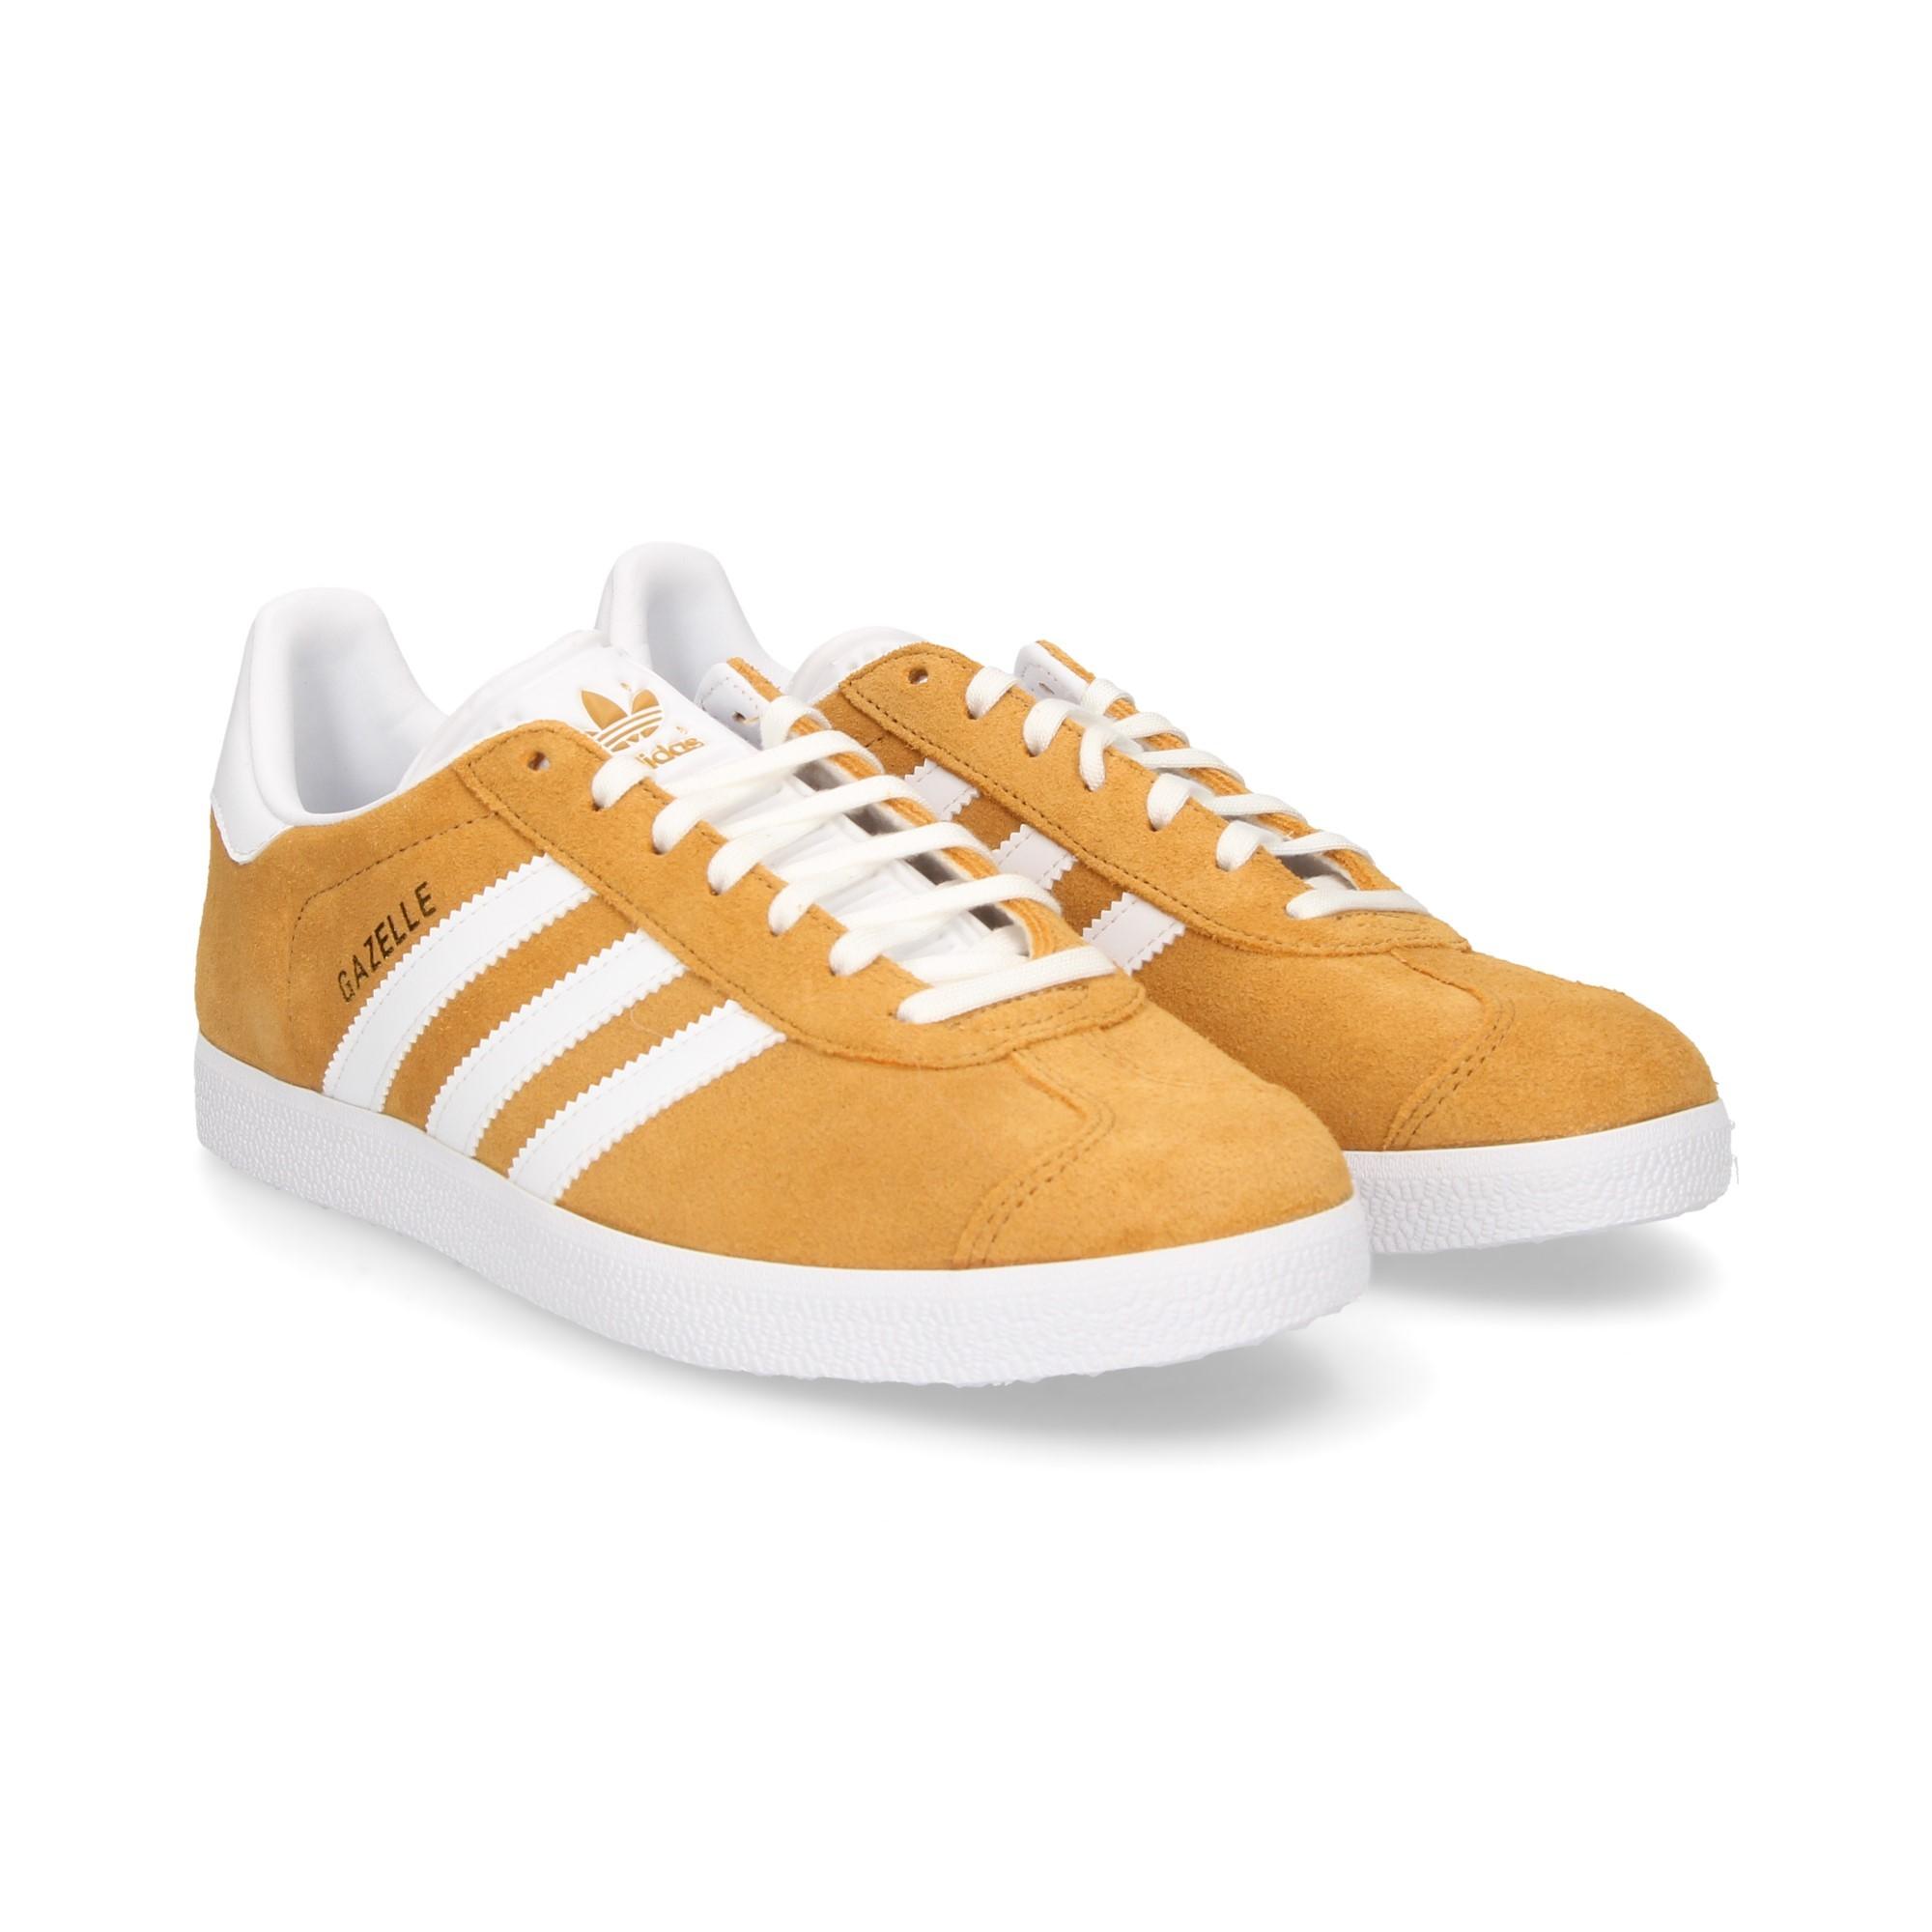 online store 41b48 97fb9 ... 3-bandas-blancas-deportivo-ante-beige ...